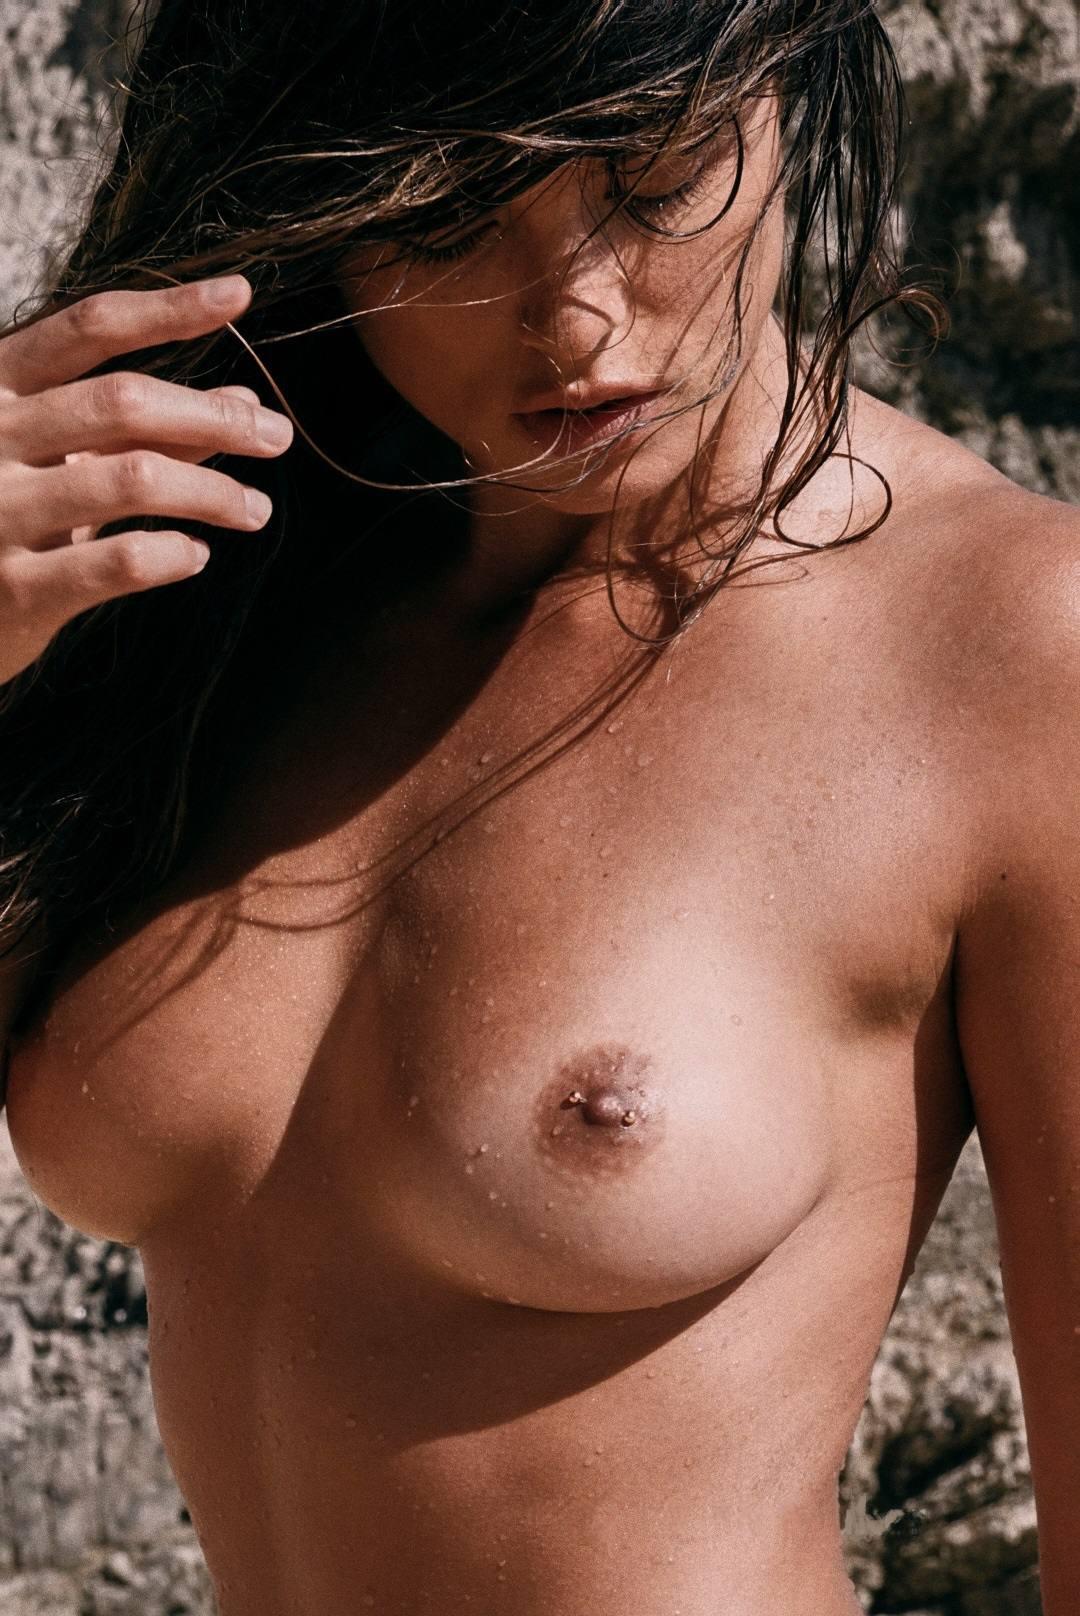 Cherokee Luker Topless